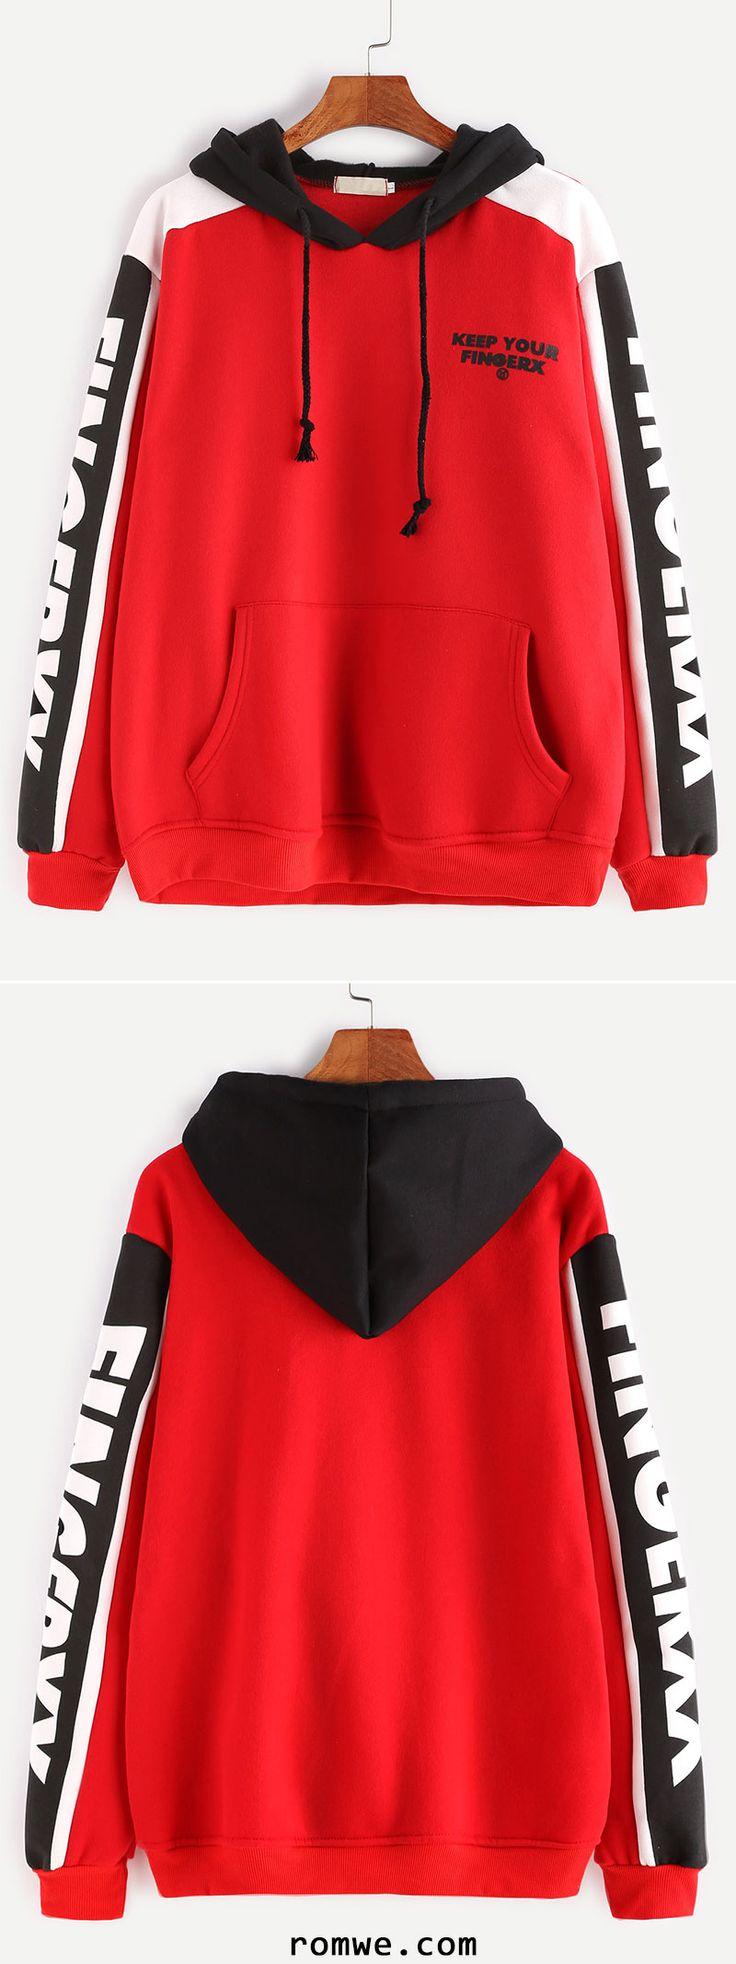 Red Contrast Letter Print Drawstring Hooded Pocket Sweatshirt